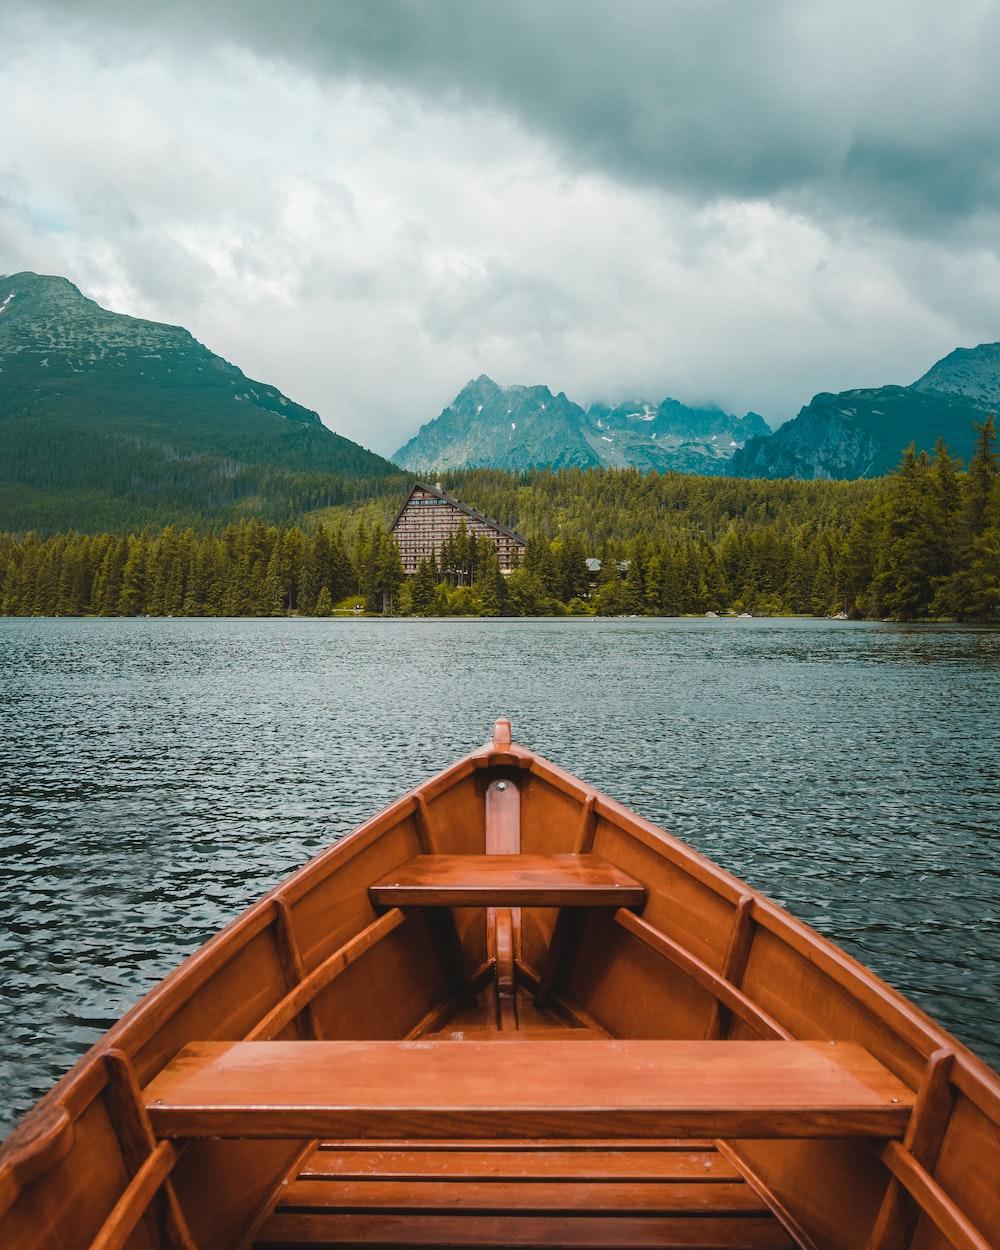 brown canoe on water